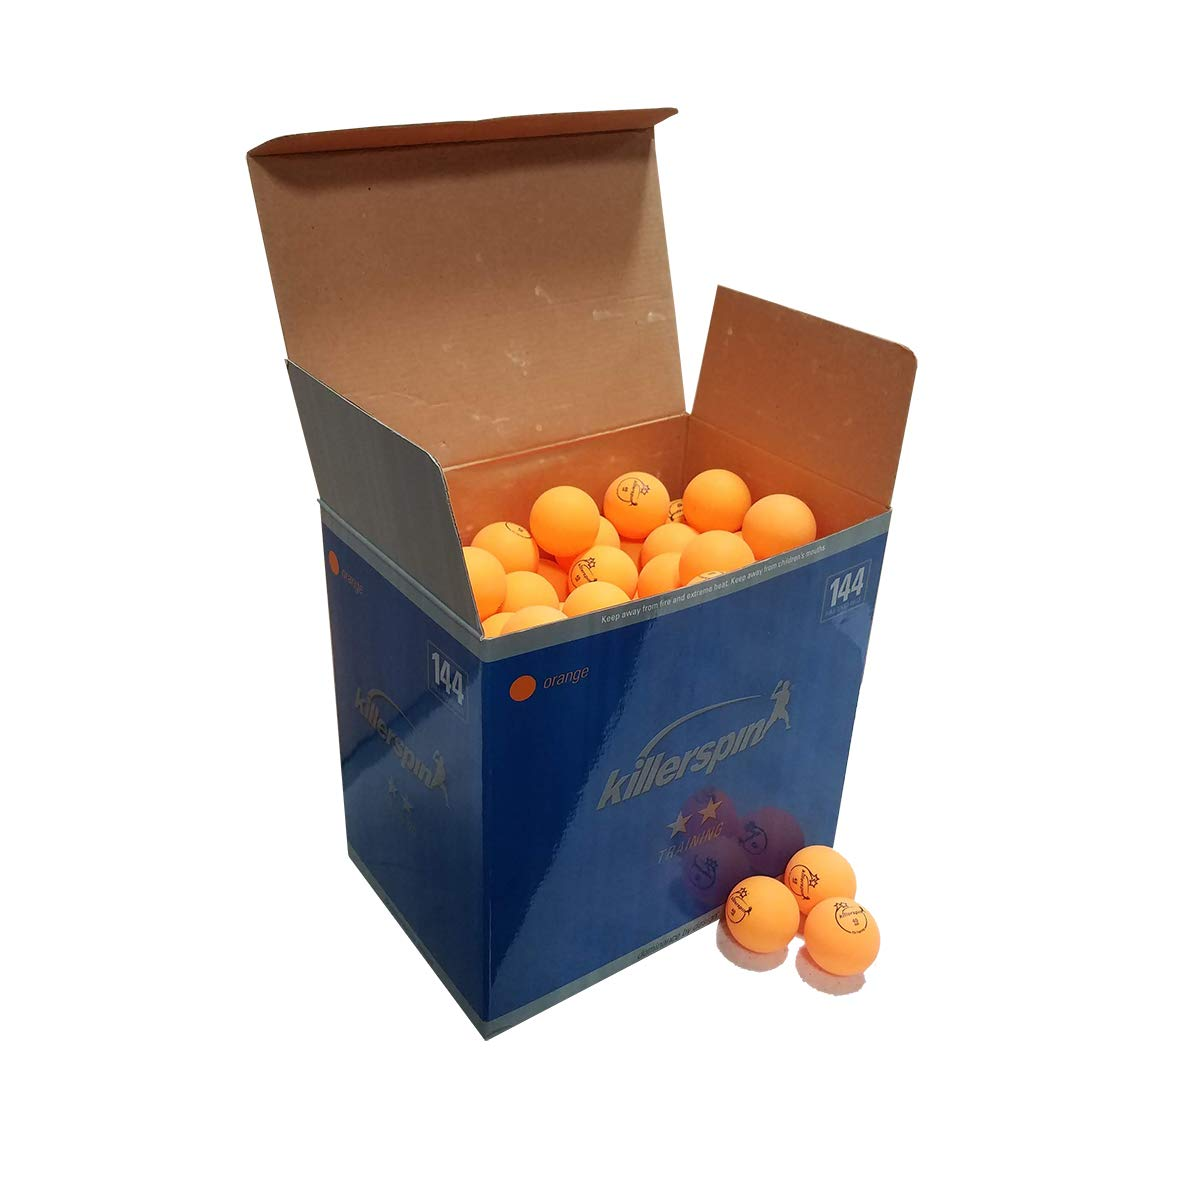 Killerspin 2 Star Training Table Tennis Balls, 144-Pack, Orange